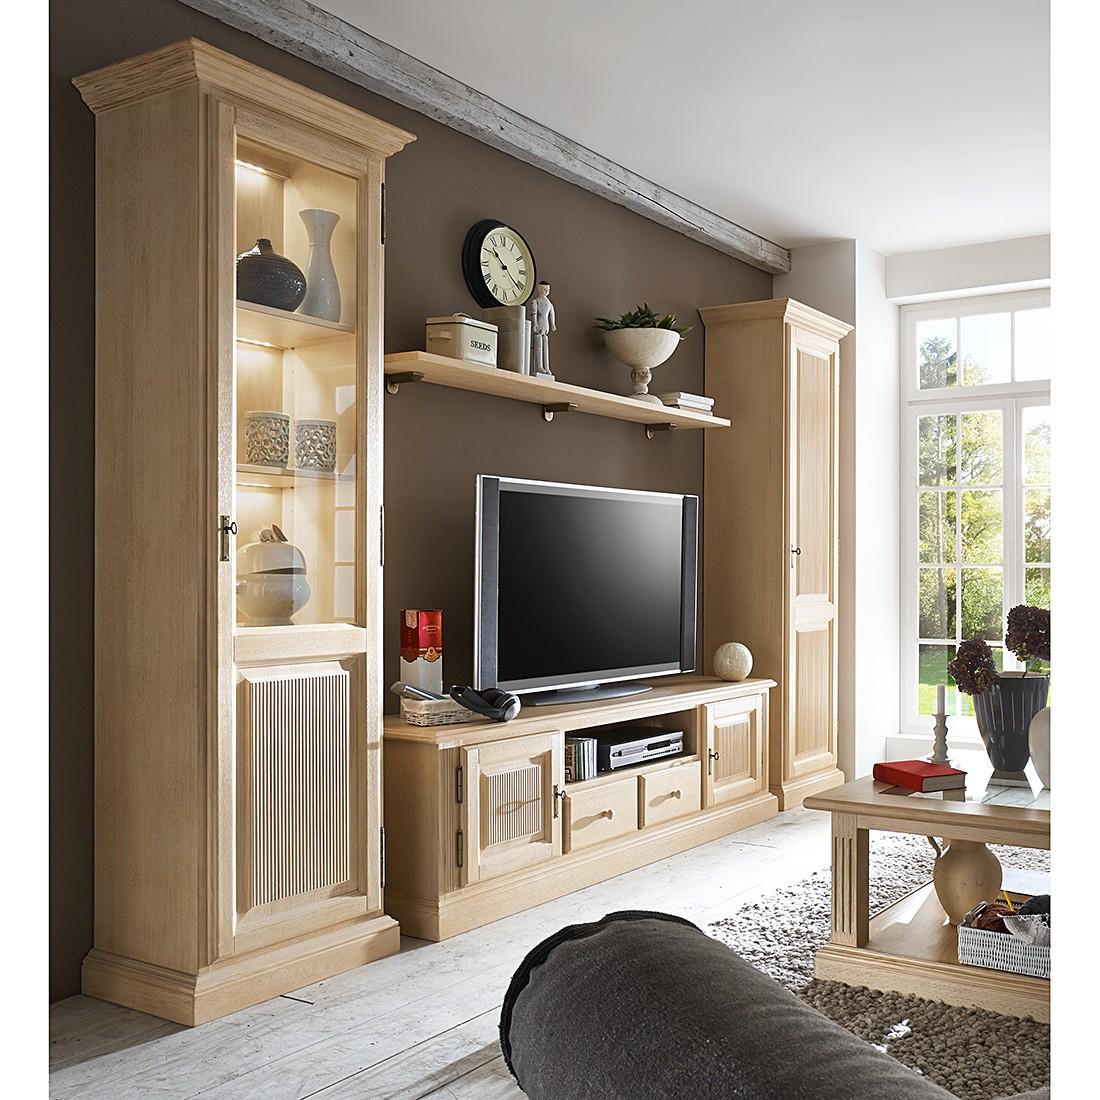 Ensemble de meubles TV Breddin I (4 éléments) - Pin massif - Sans éclairage, Ars Natura